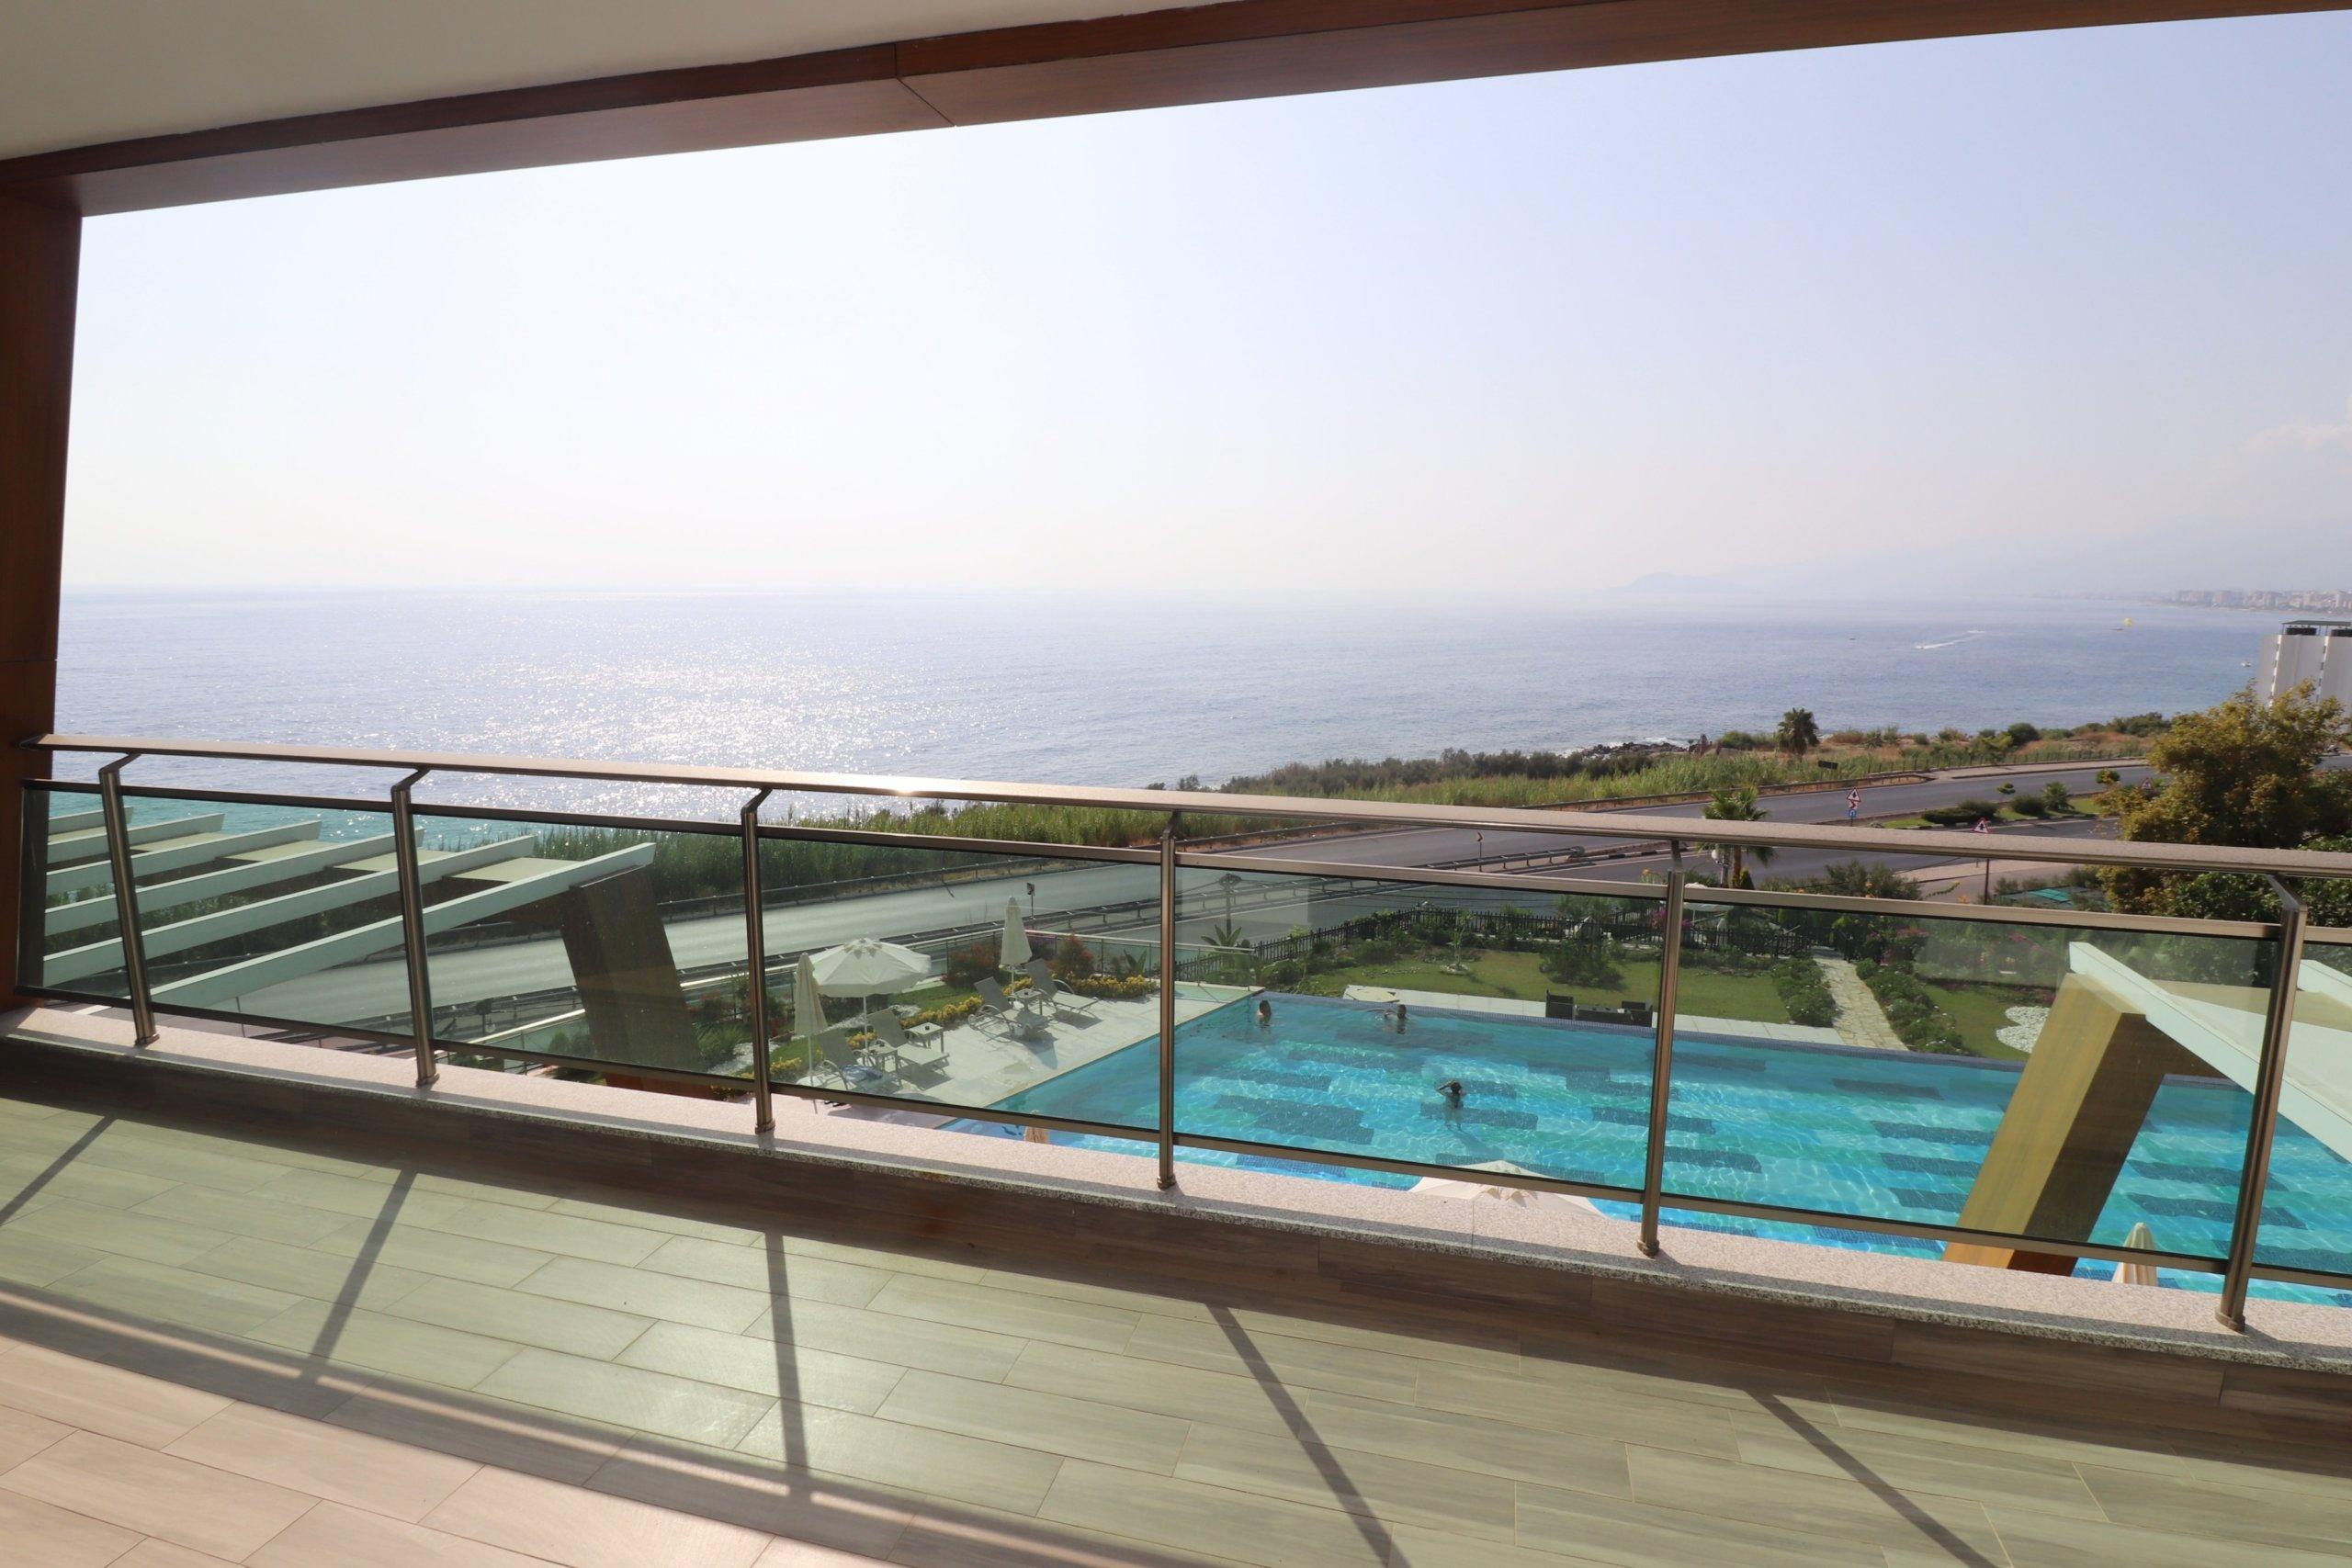 1+1 в Люкс резиденции с видом на море в тихом районе Алании